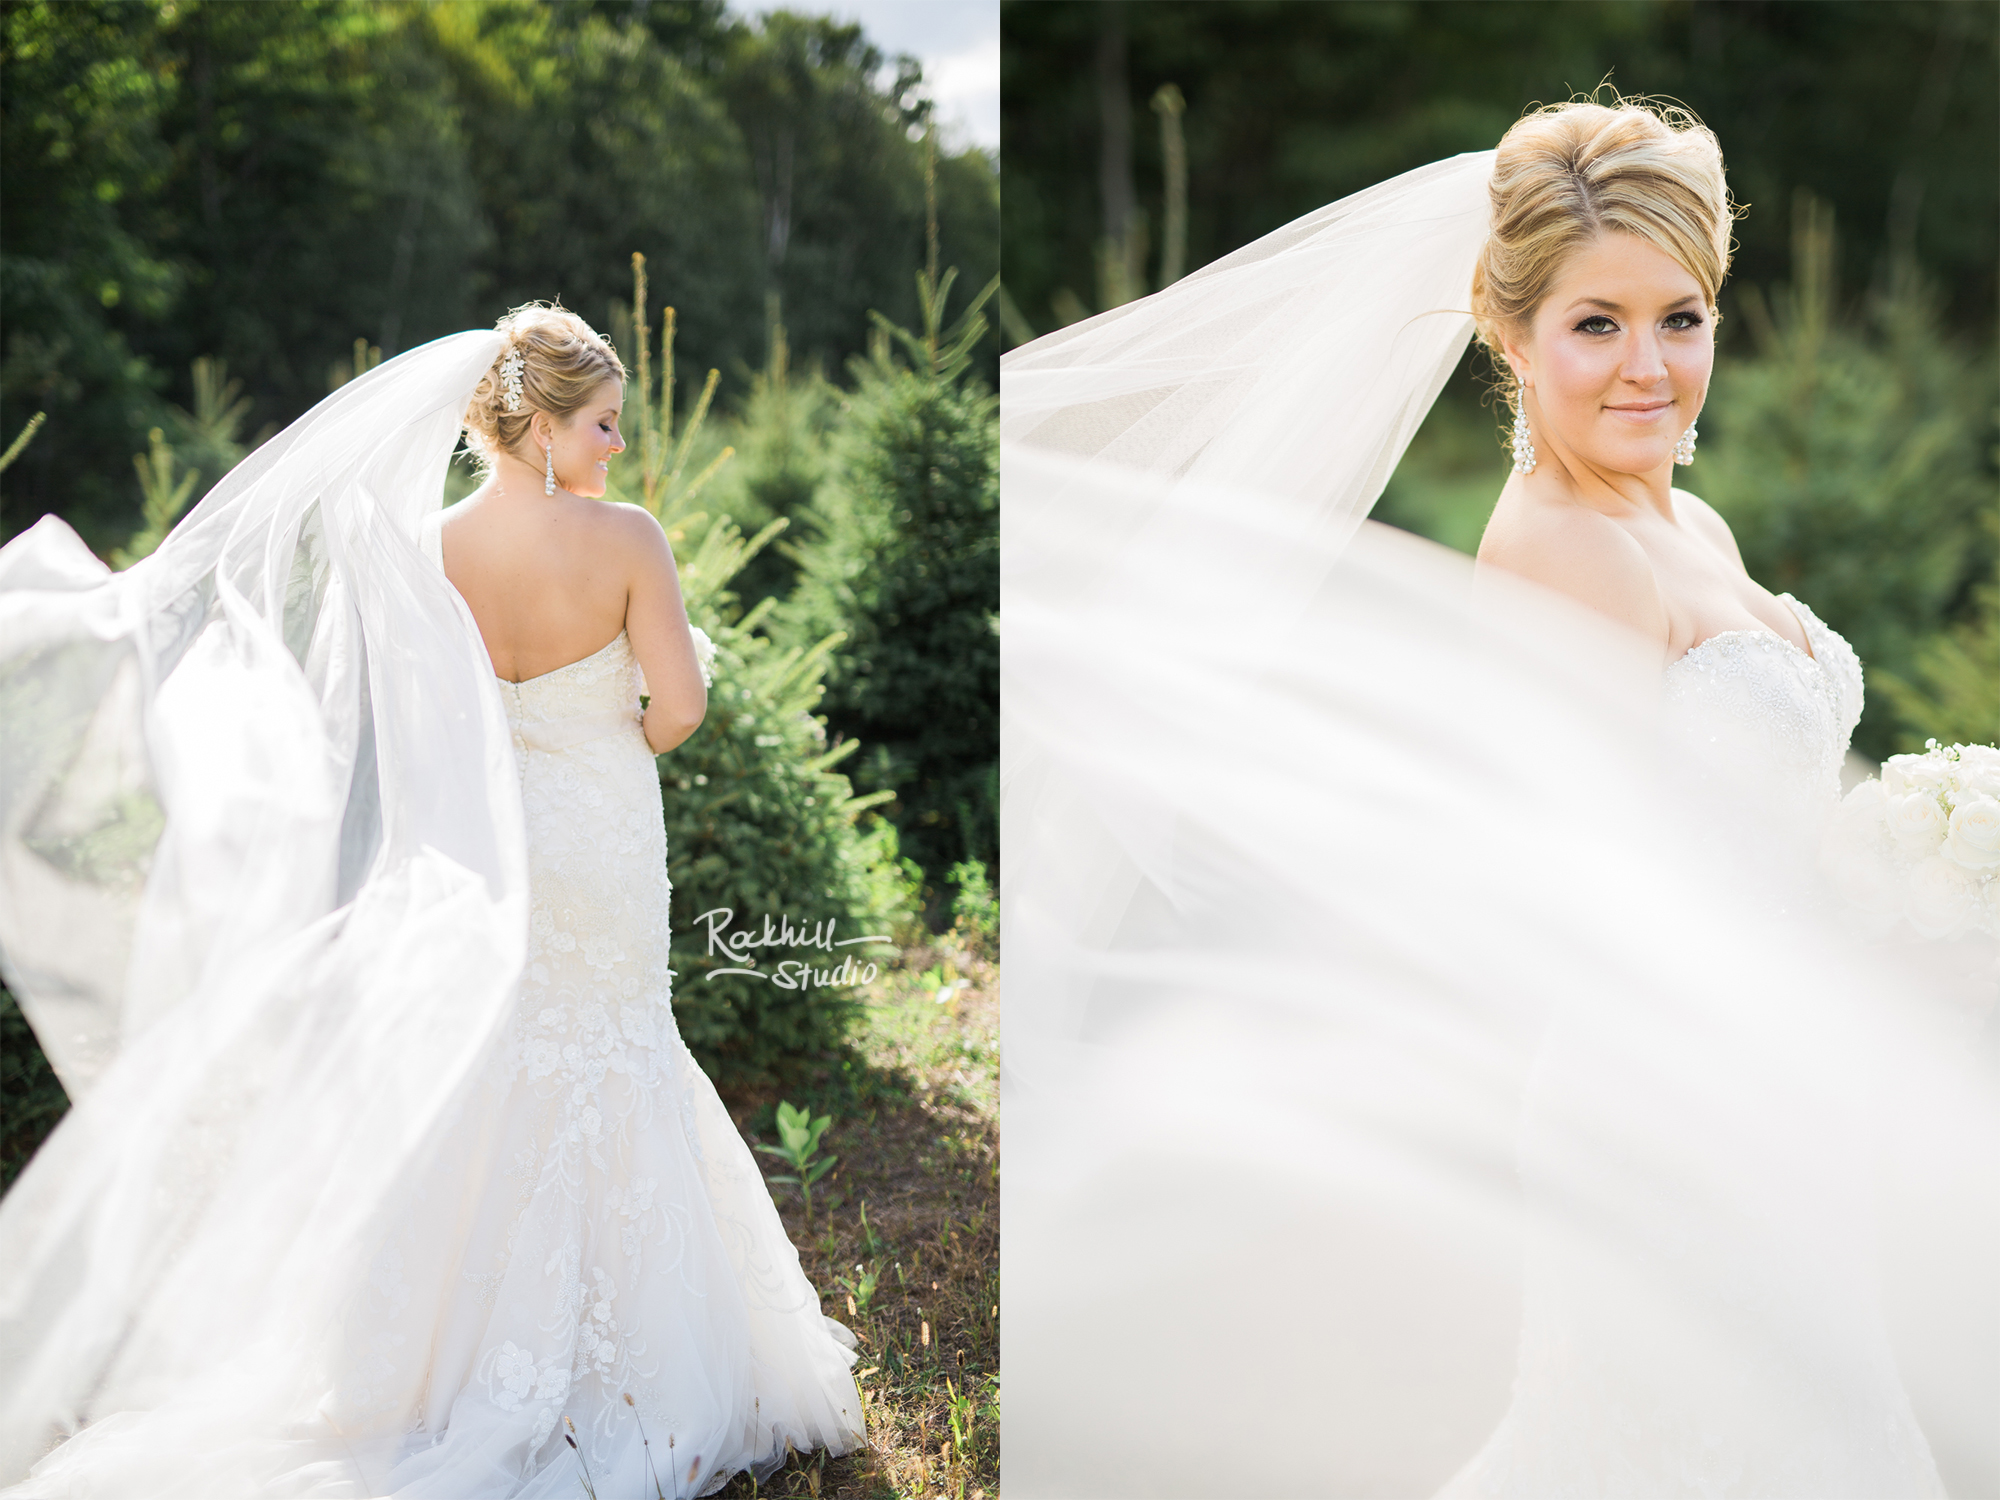 rockhill-studio-newberry-michigan-wedding-curtis-upper-peninsula-bridal-portrait.jpg